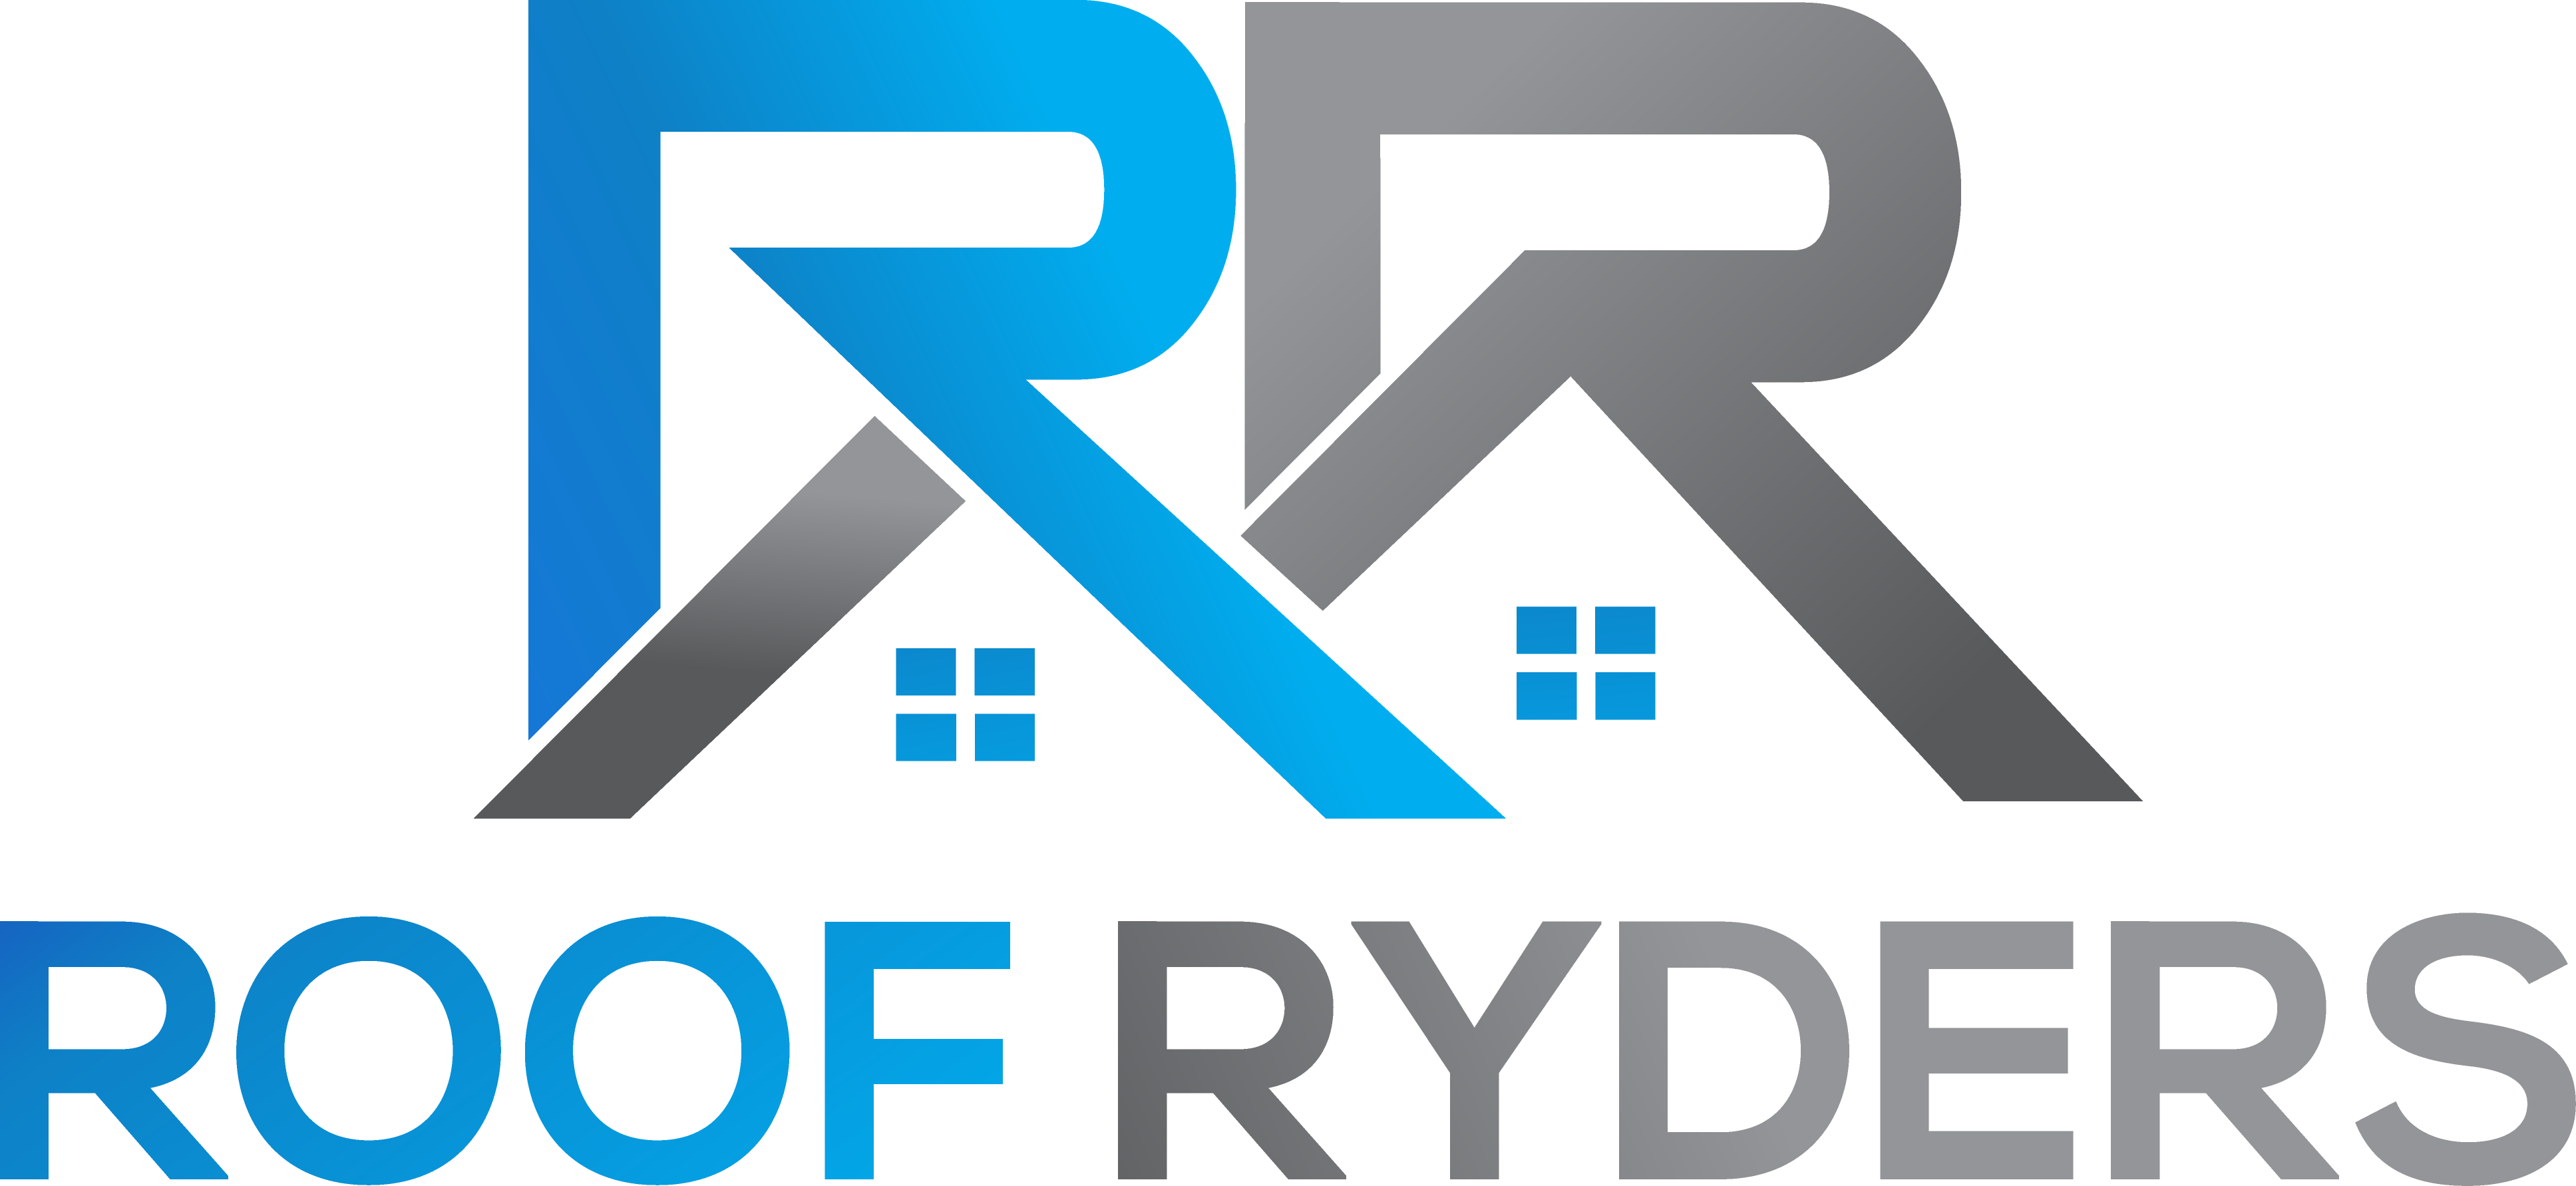 Roof Ryders Calgary Logo